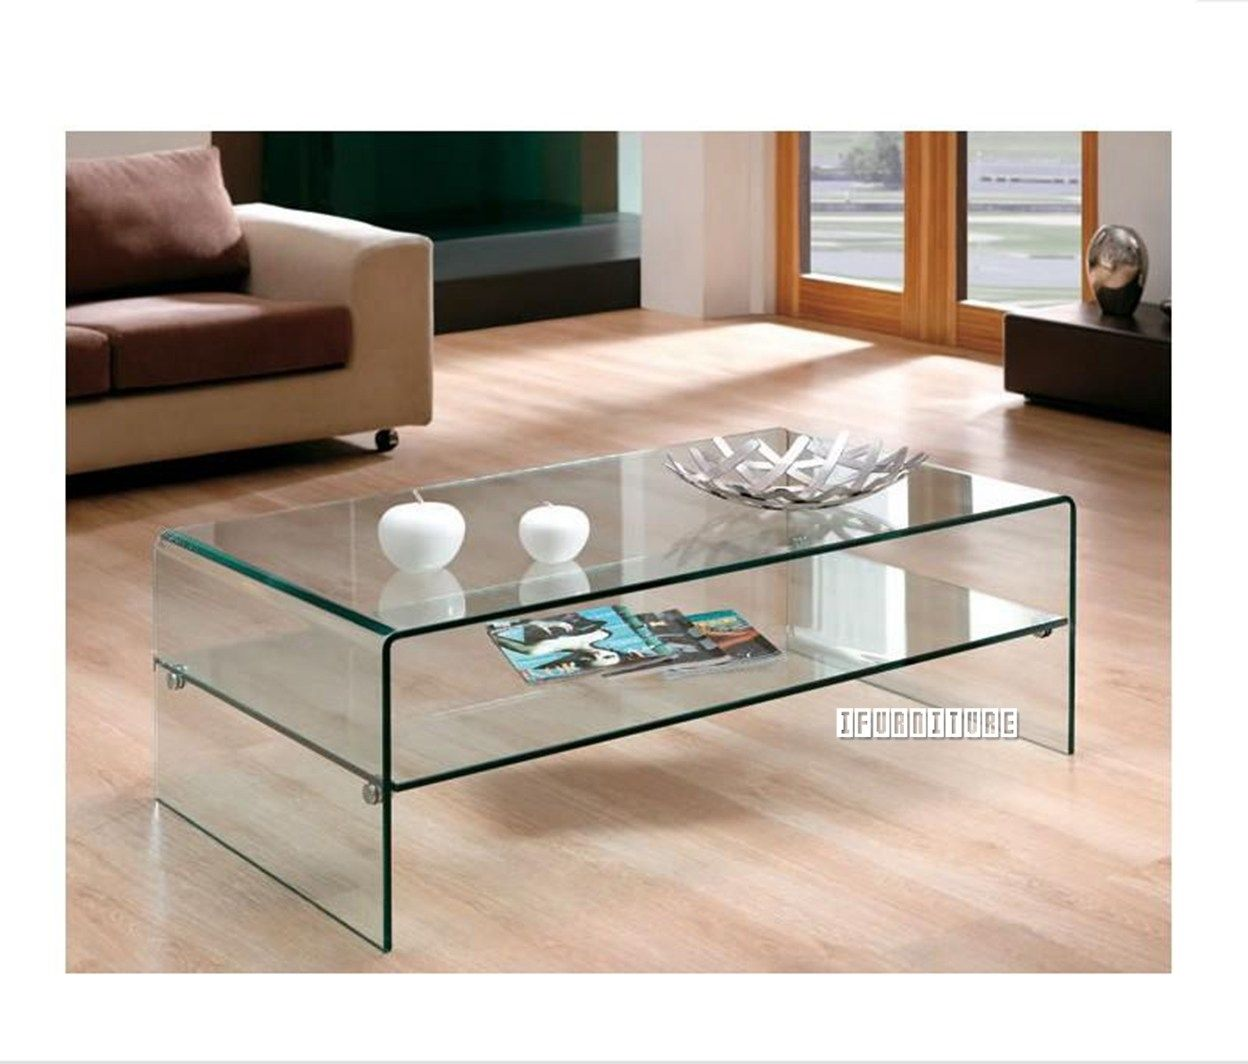 Murano Bent Glass Coffee Table With Shelf Coffee Table With Shelf Coffee Table Table Design [ 1064 x 1248 Pixel ]